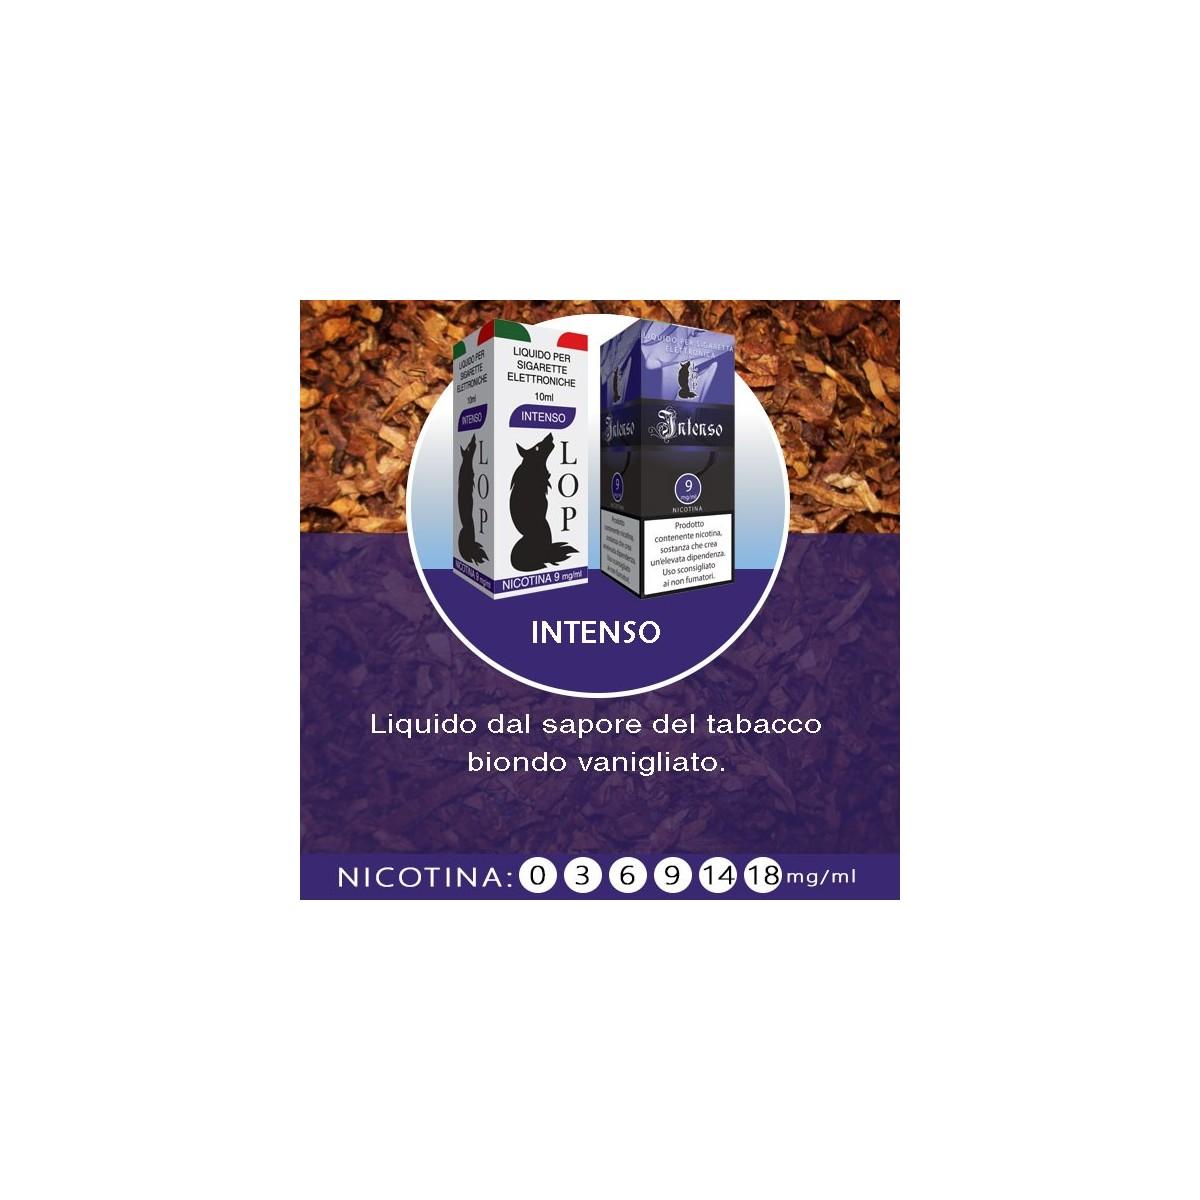 LOP - Intenso 10ml-0mg/ml